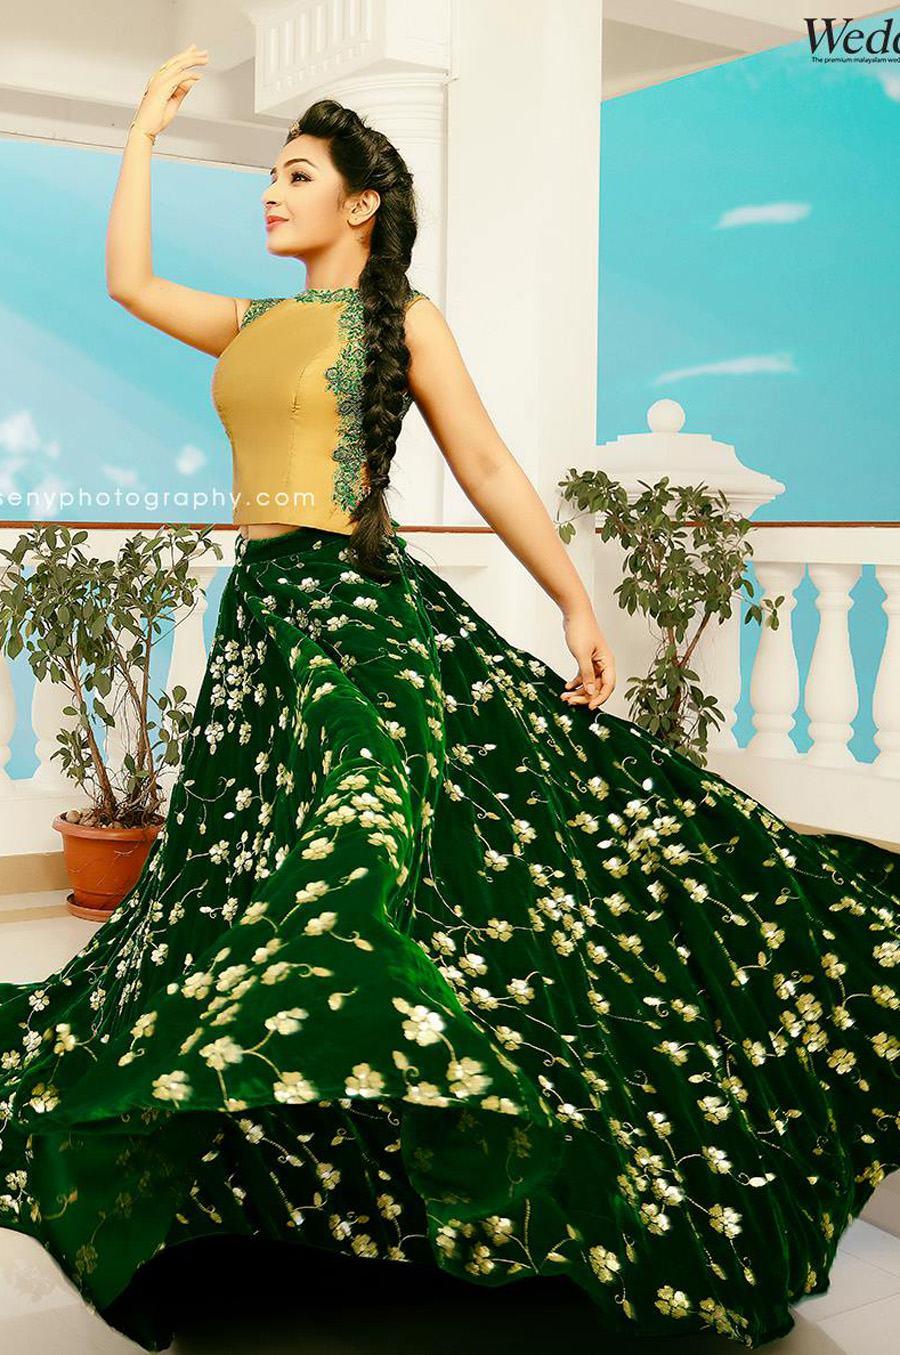 rajisha-vijayan-grihalakshmi-photo-shoot-by-seny-22389